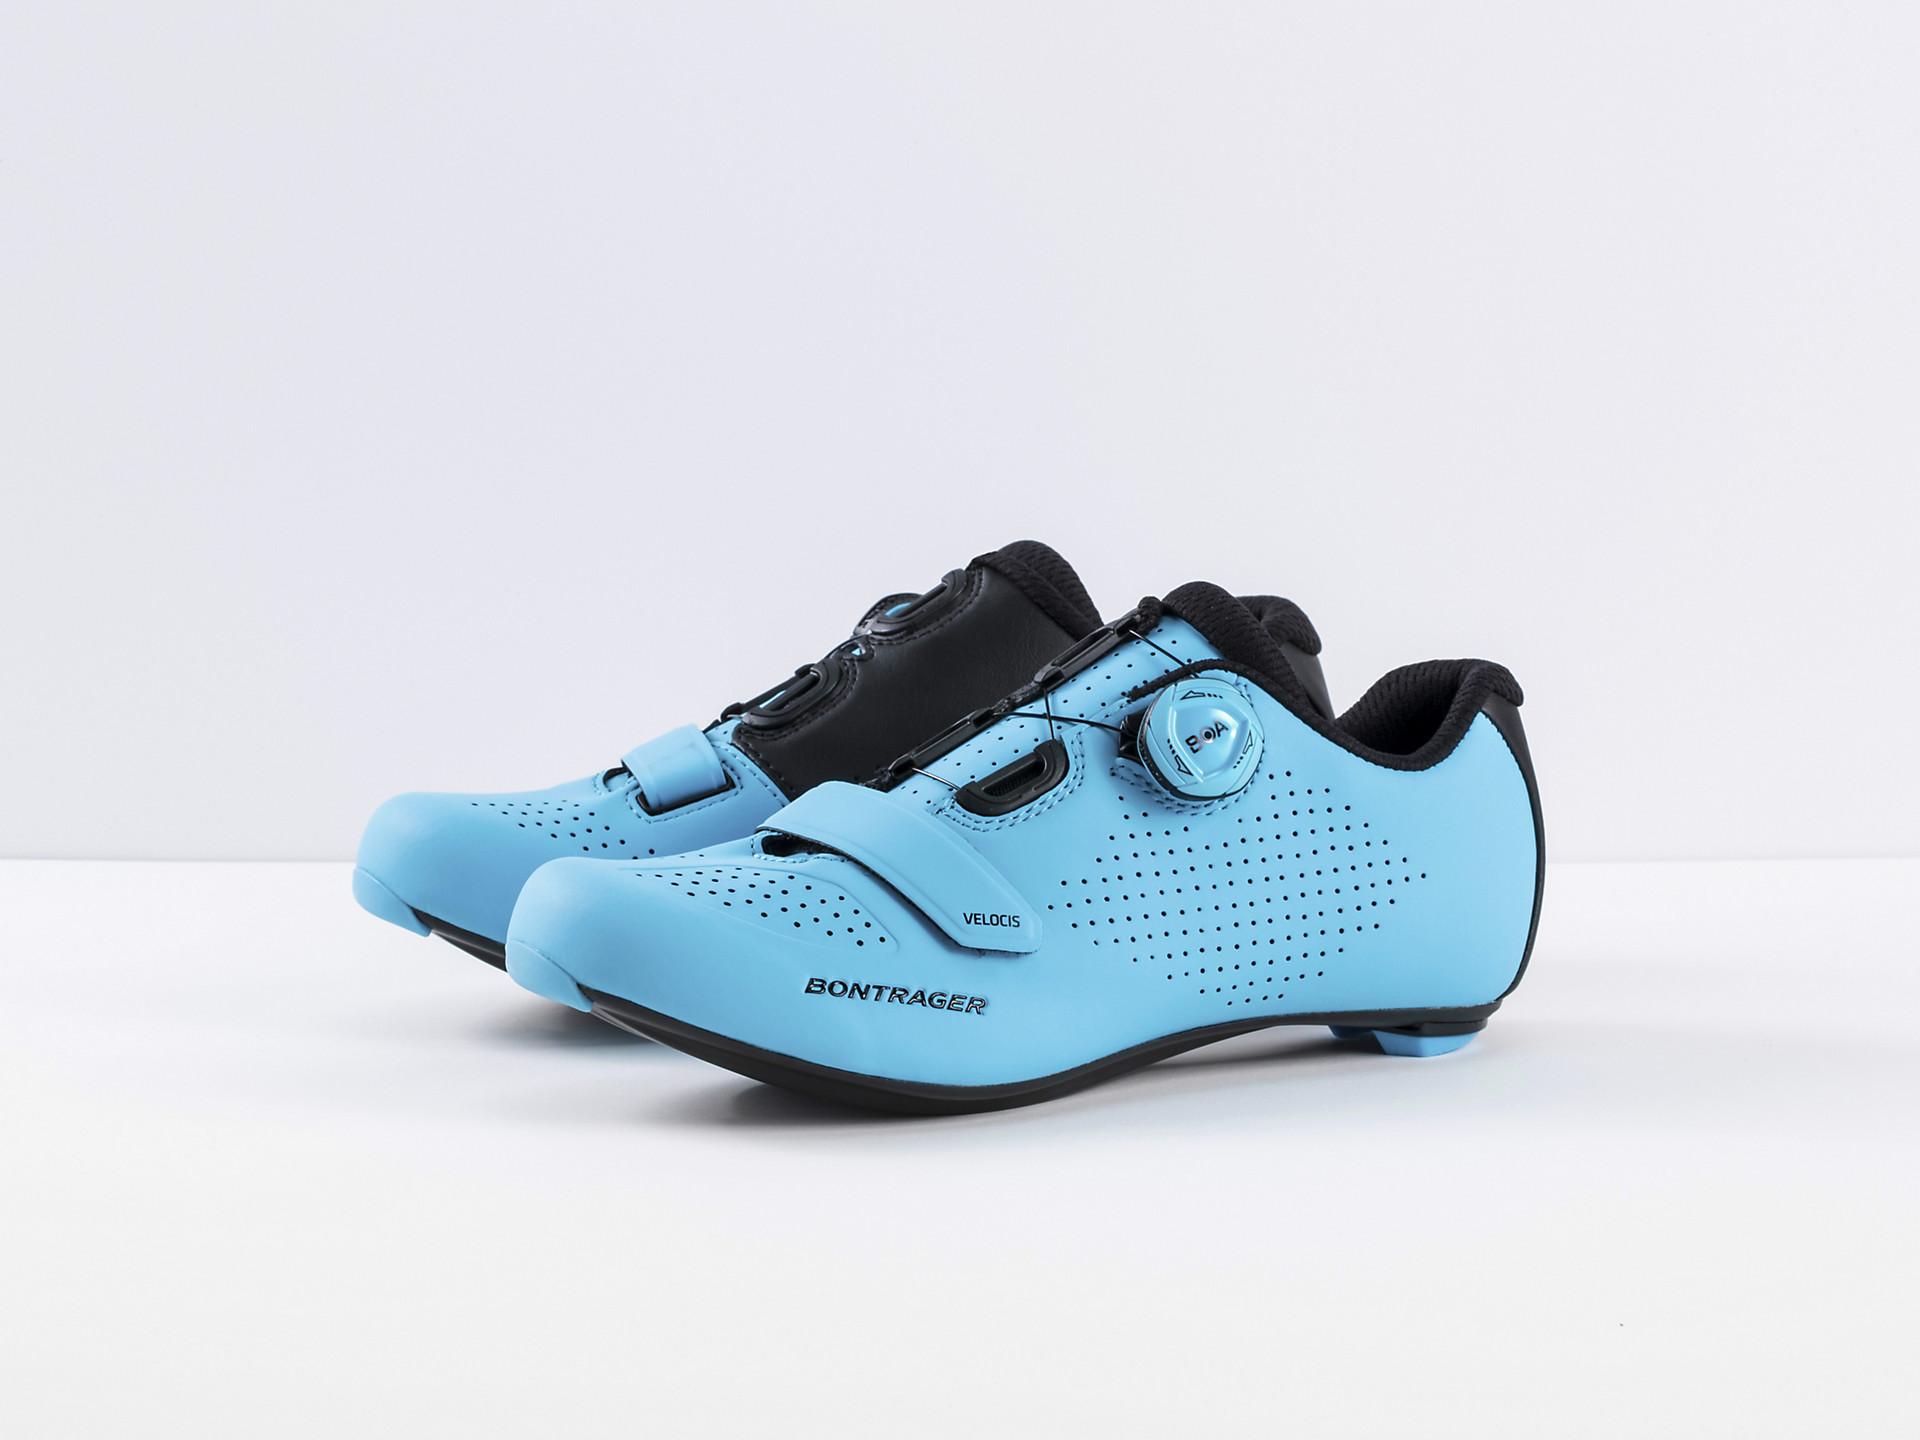 Bikesfr Route VelocisTrek Femme Bontrager Chaussure 5ALq4jR3